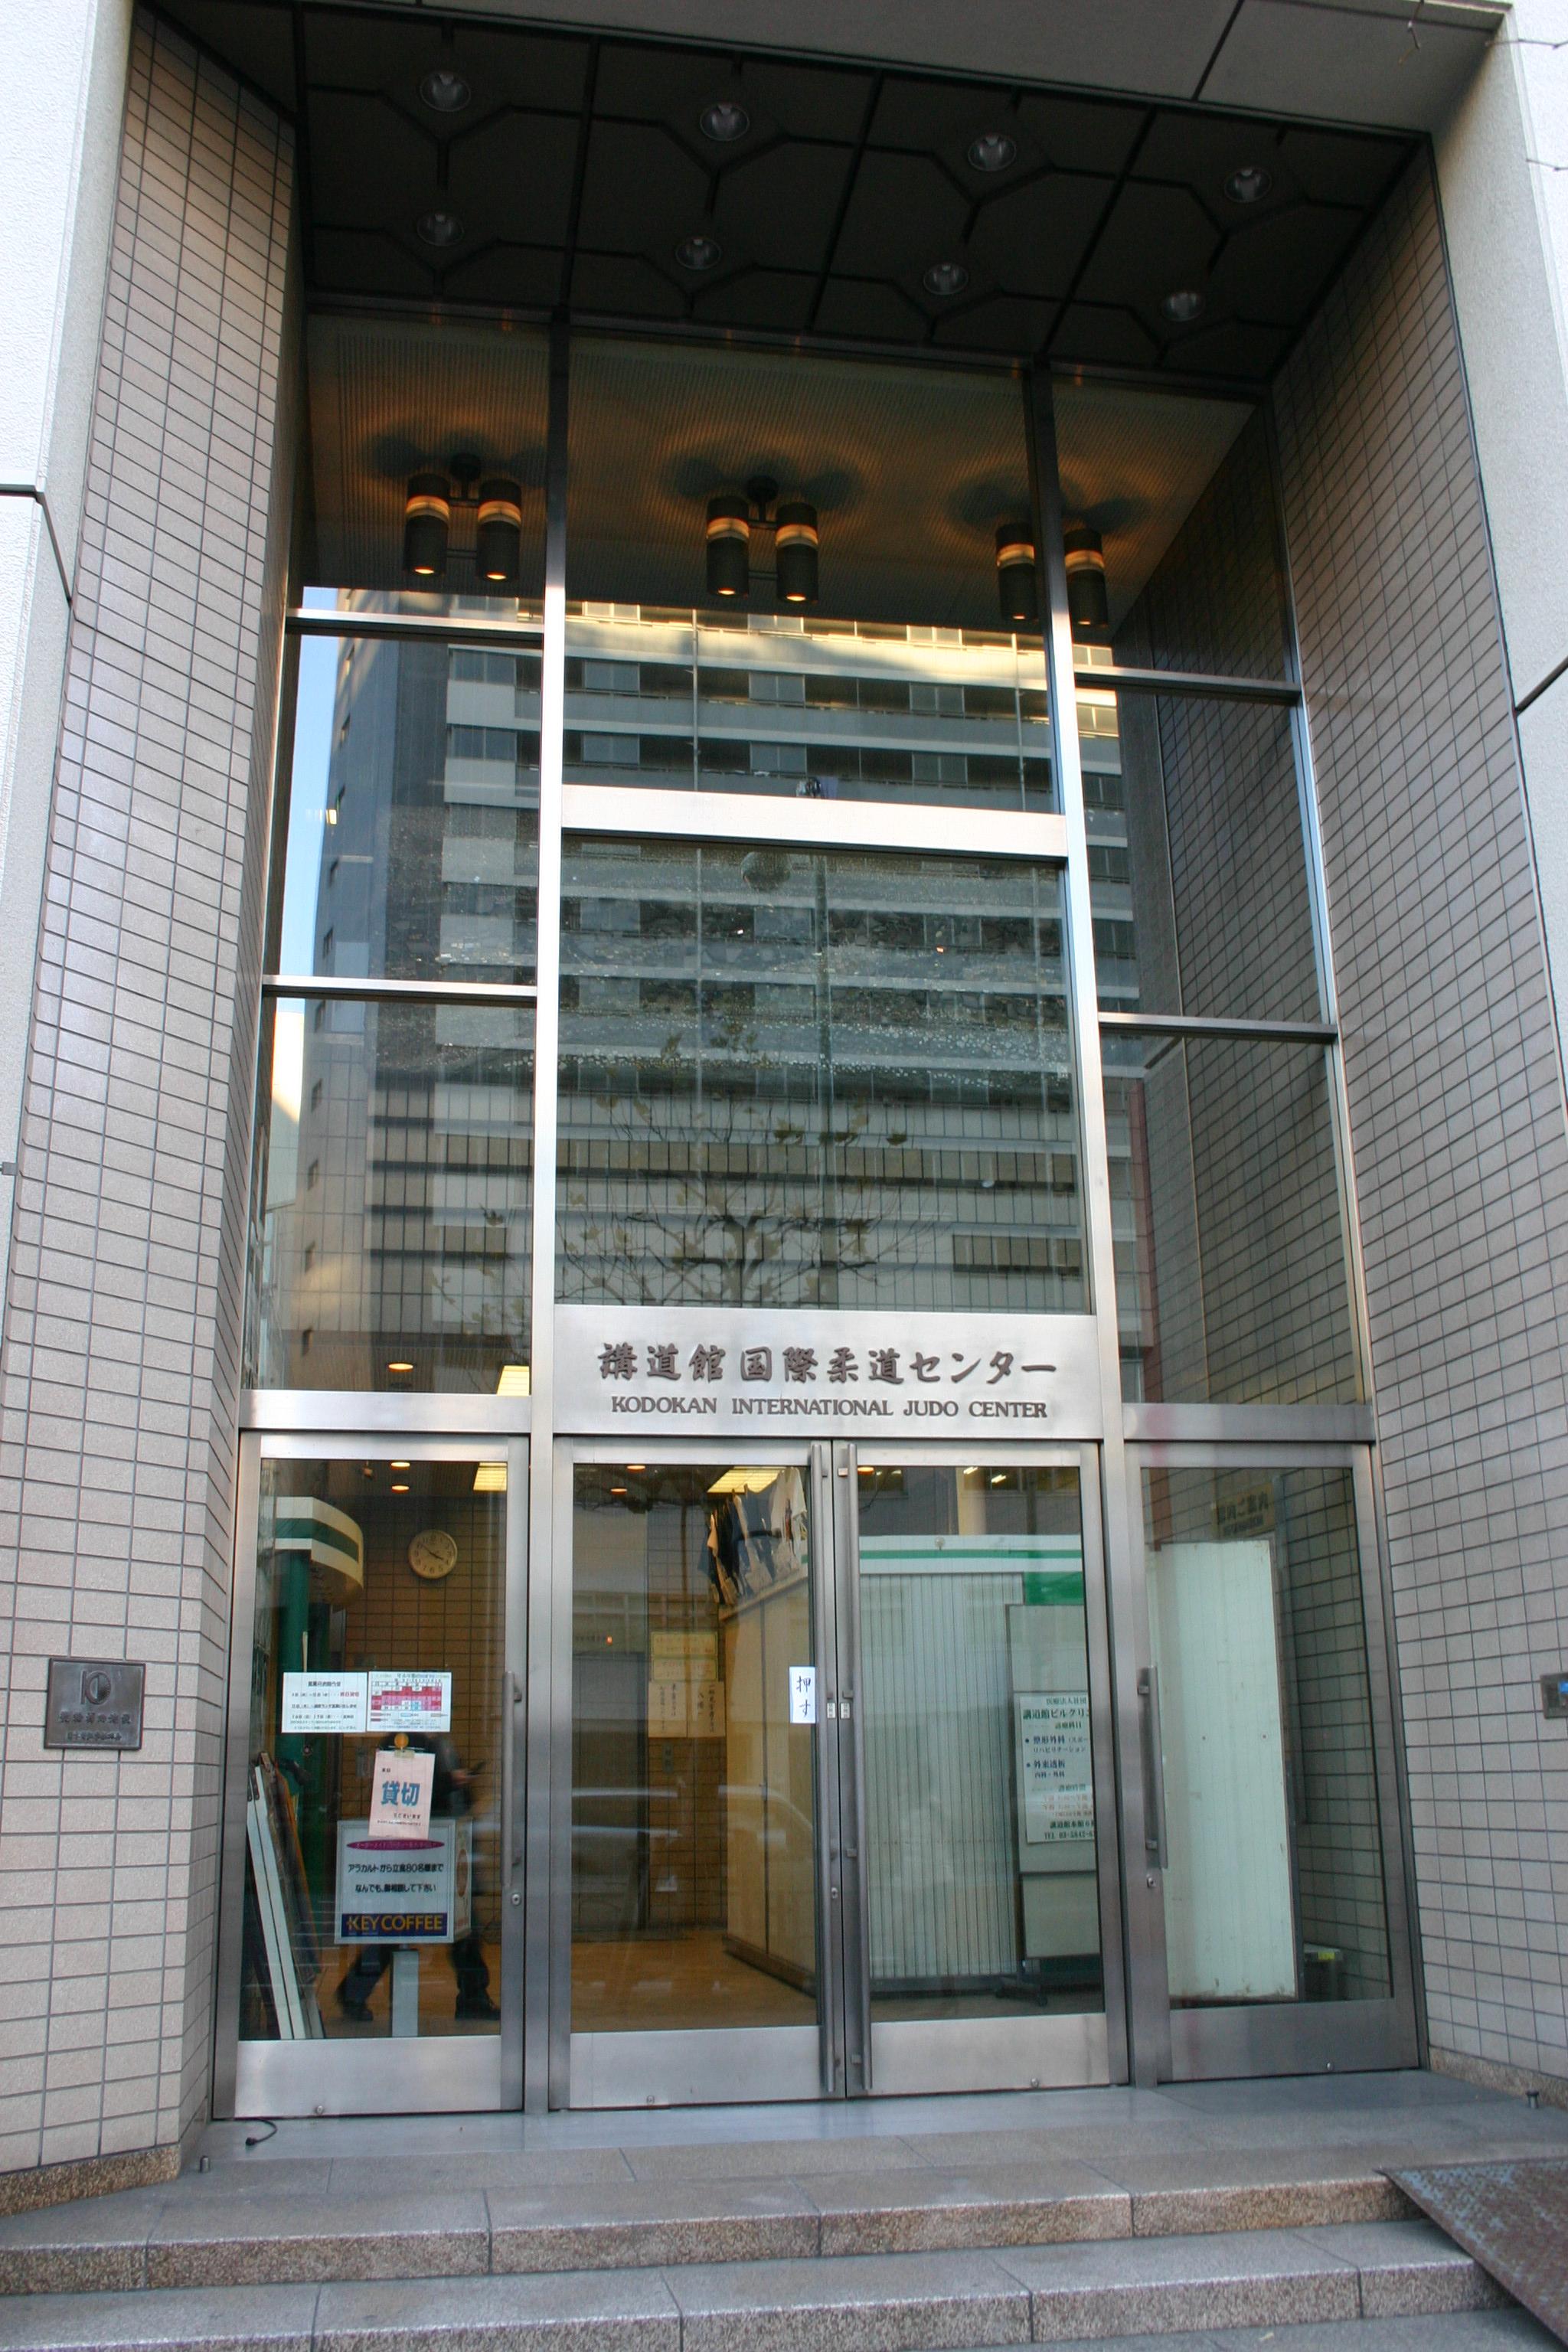 Kodokan Judo Institute - Wikipedia